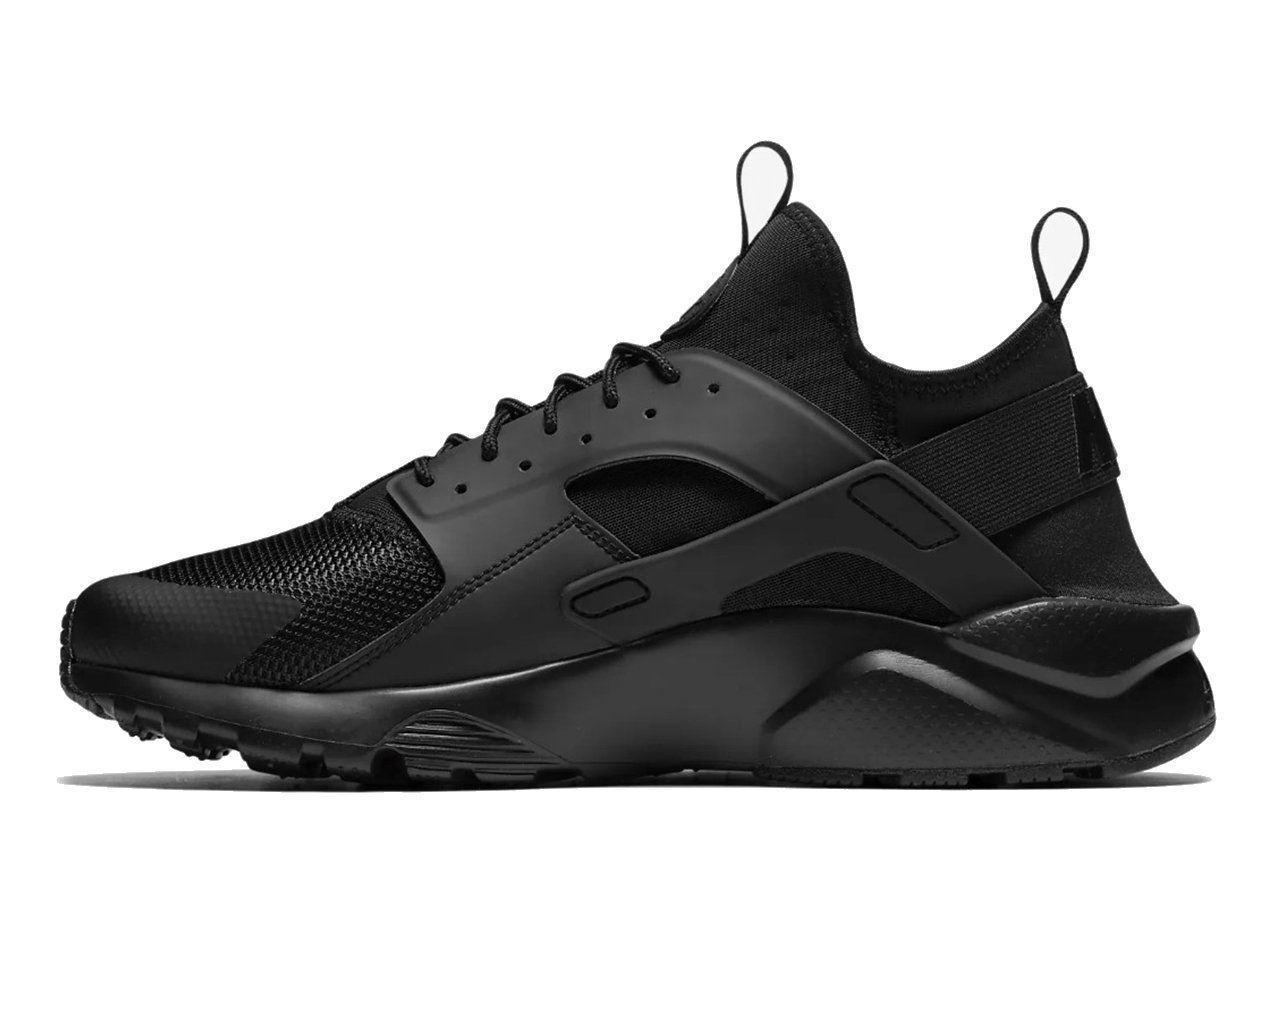 nike trois air huarache cours ultra taille 10,5 noir chaussures trois nike hommes c56531